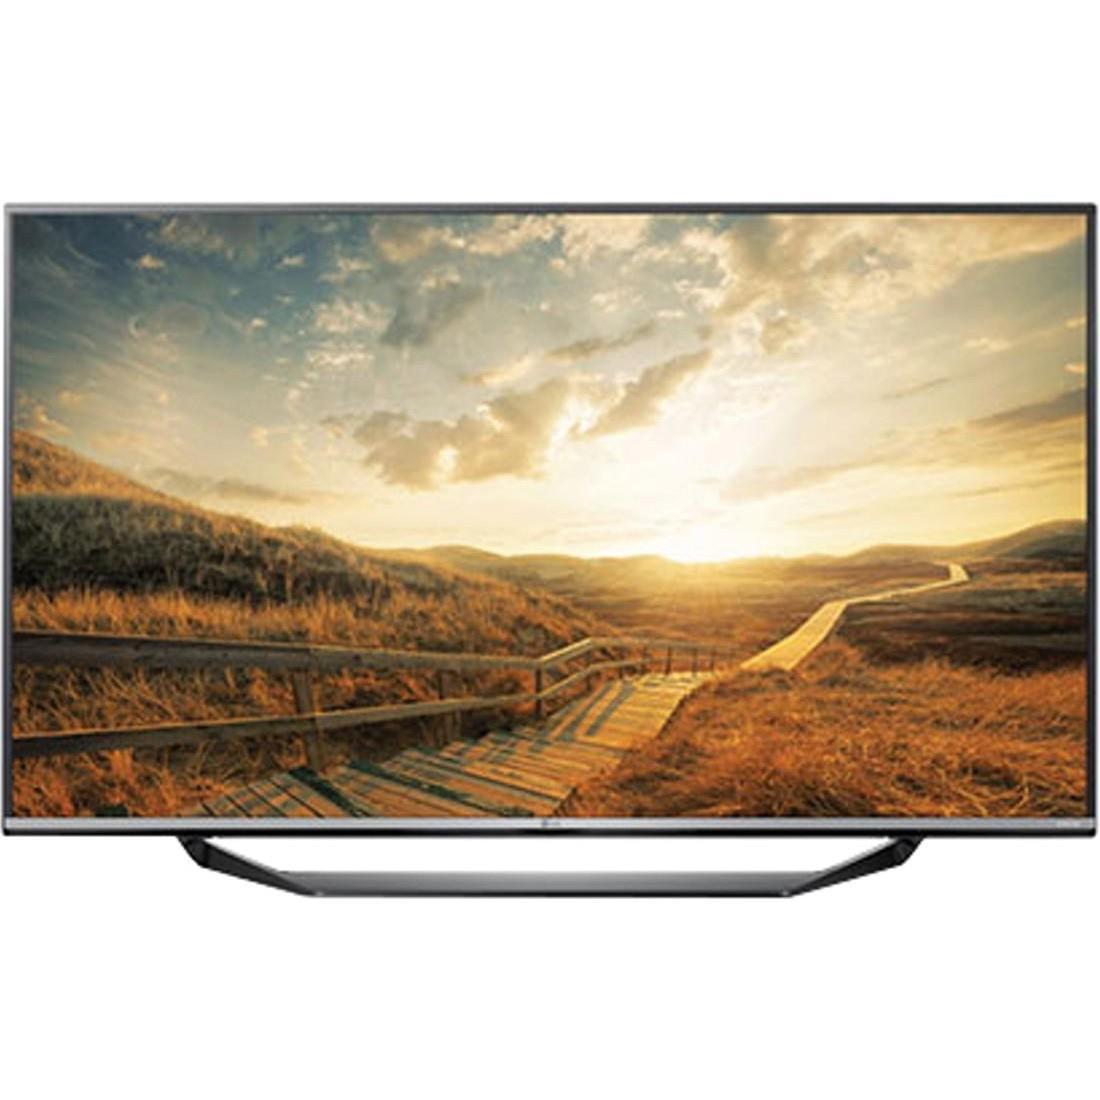 LG 49UF670T 123 cm (49) LED TV (Ultra HD (4K)) Image